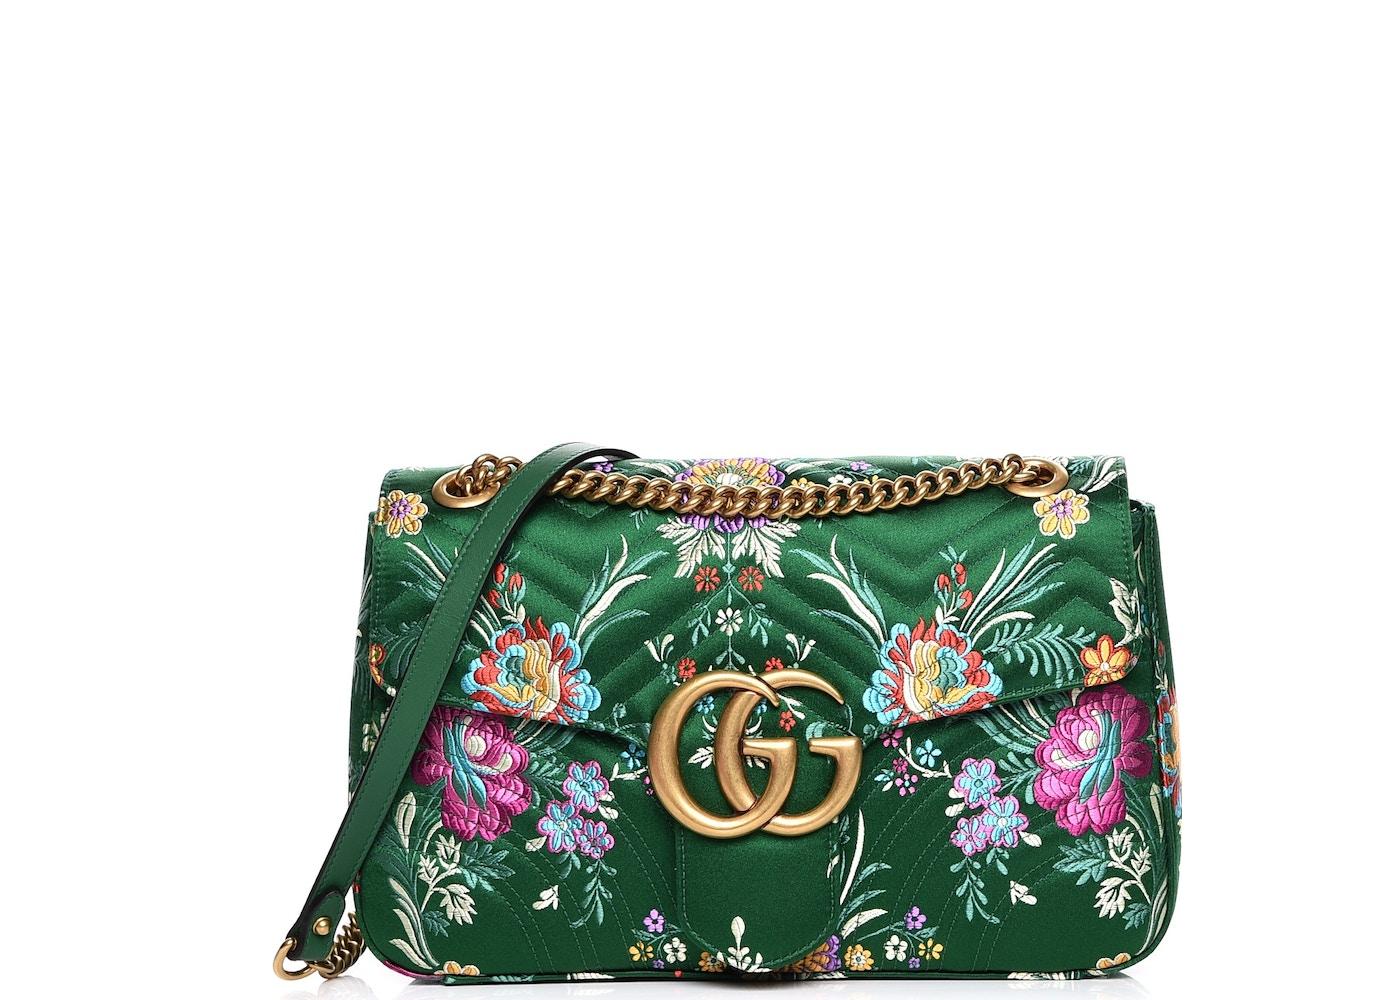 200a1cde9127 Gucci Marmont Matelasse GG Floral Jacquard Interlocking GG Logo ...